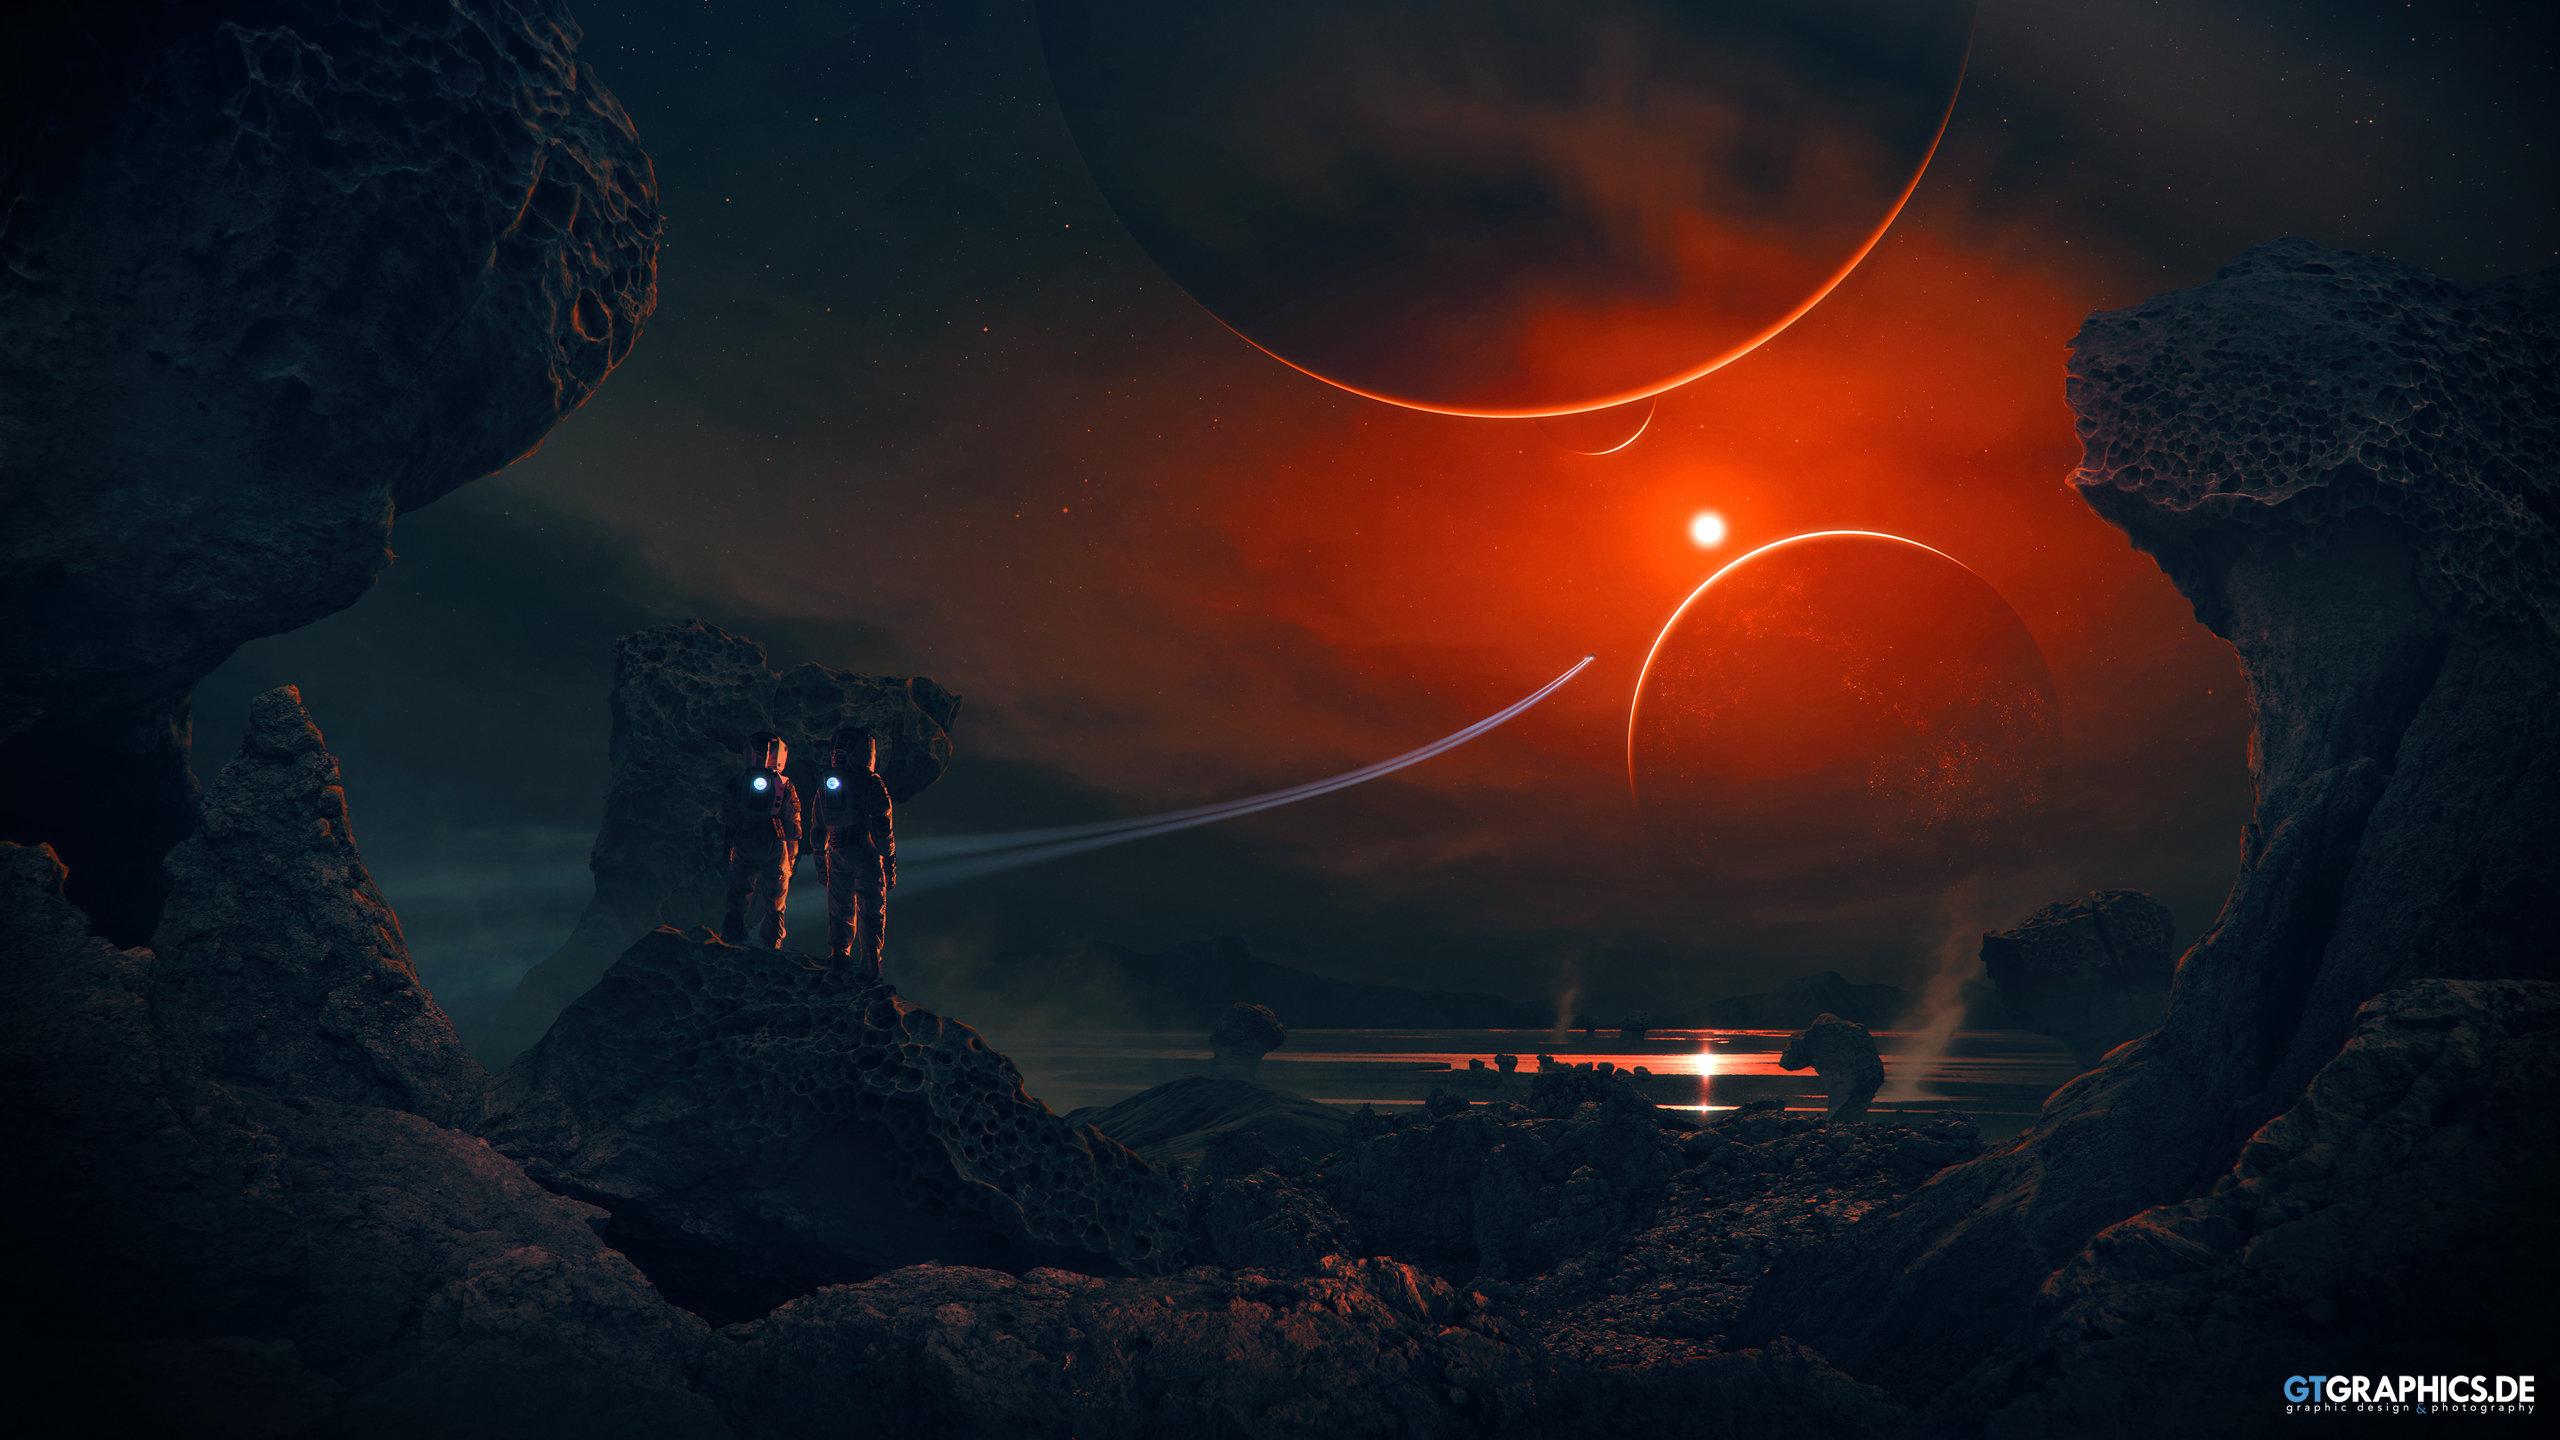 General 2560x1440 Taenaron futuristic 3D planet astronaut rock space Sun digital art spaceship GTGraphics glowing